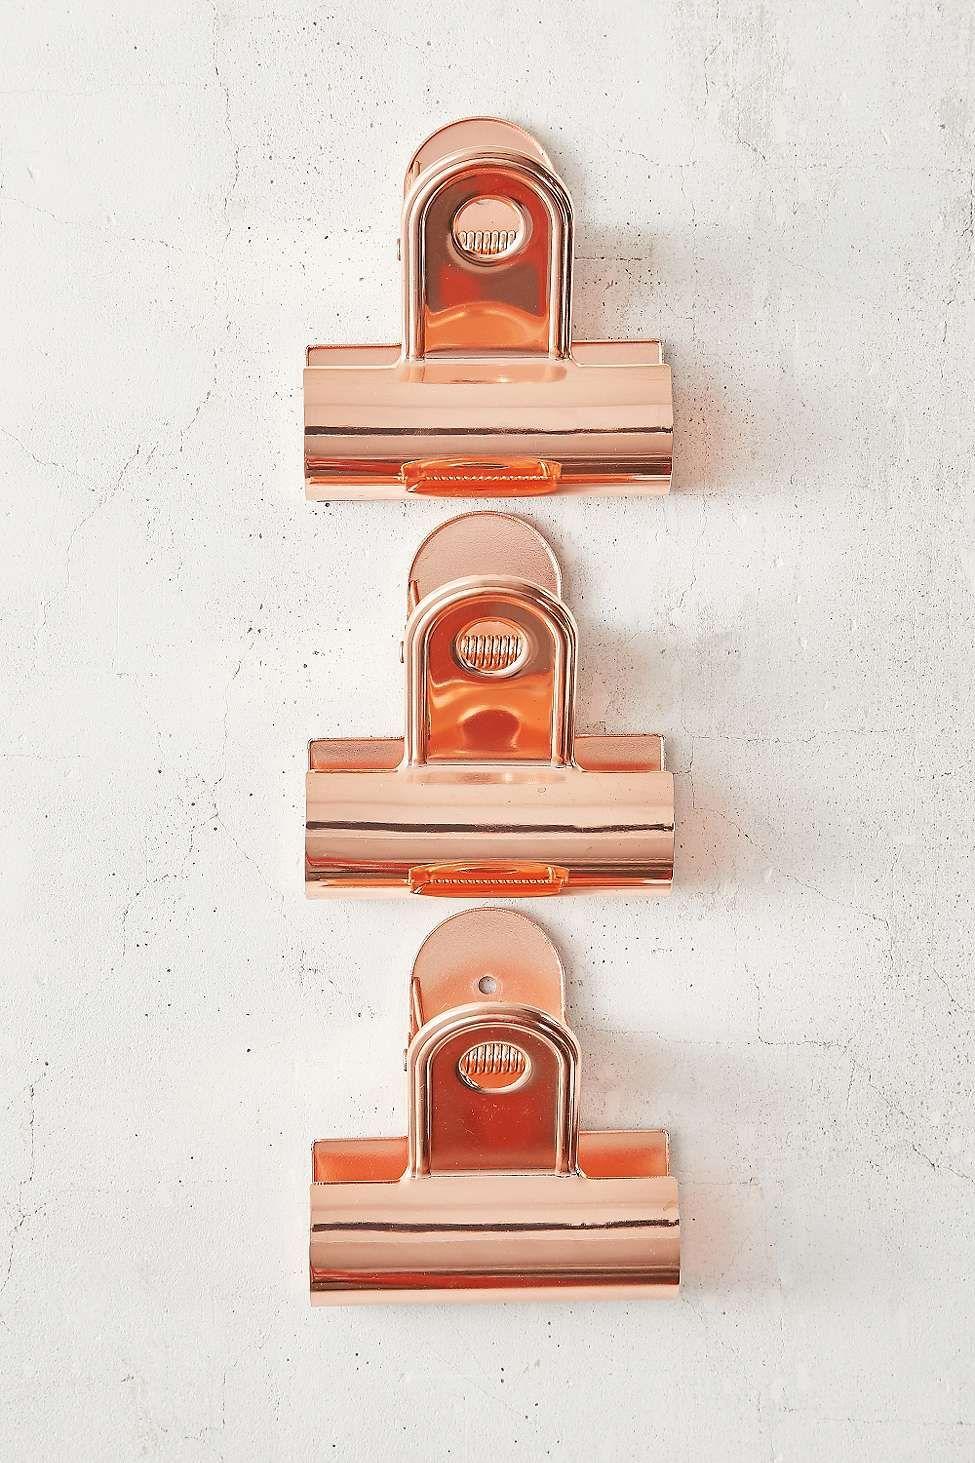 kupferrohr an der wand befestigen ostseesuche com. Black Bedroom Furniture Sets. Home Design Ideas